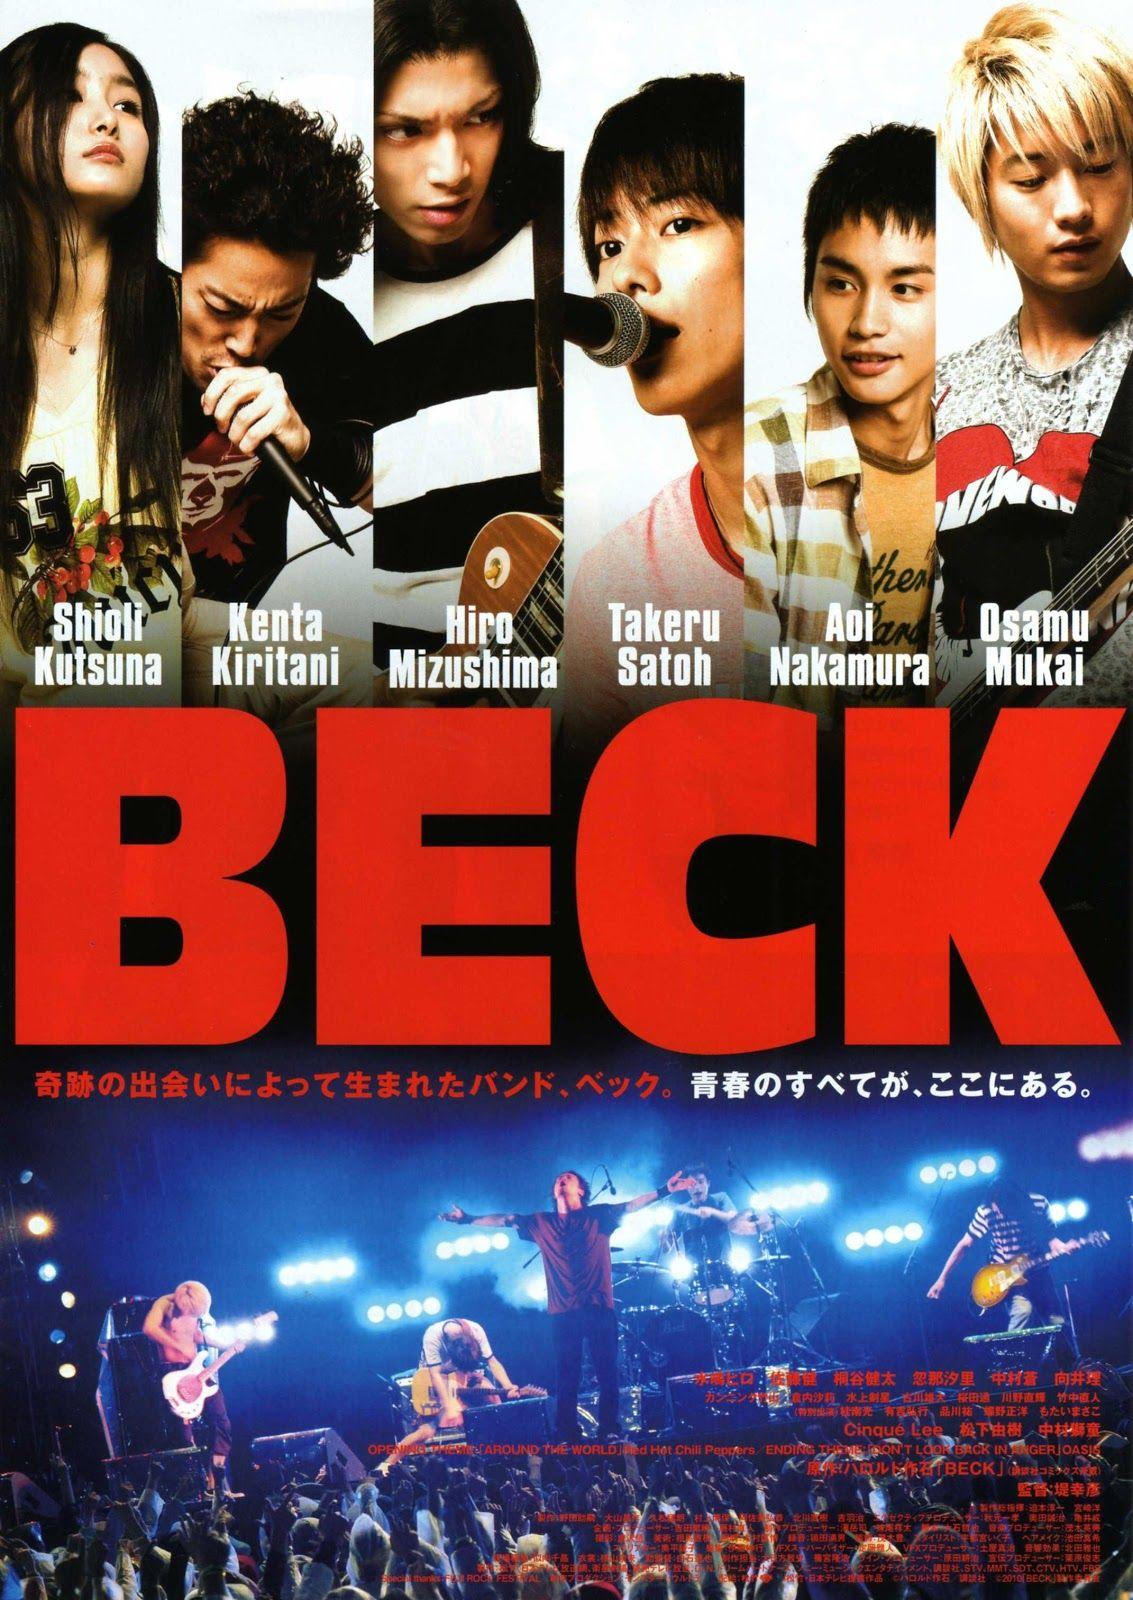 BECK Live Action Movie Subtitle Indonesia Japan Drama